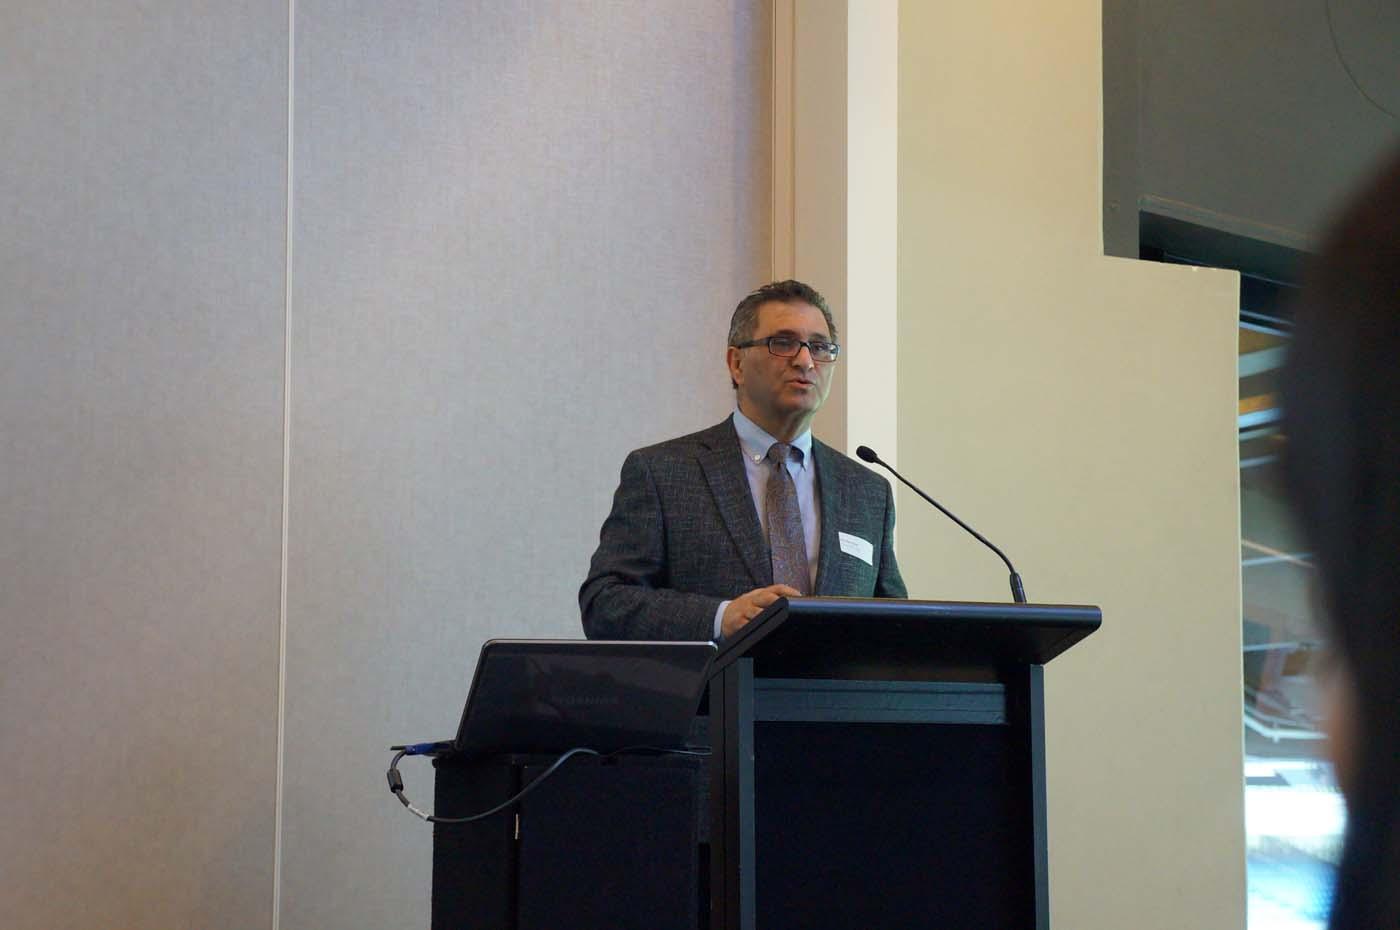 Photo of Ron Giammarino presenting